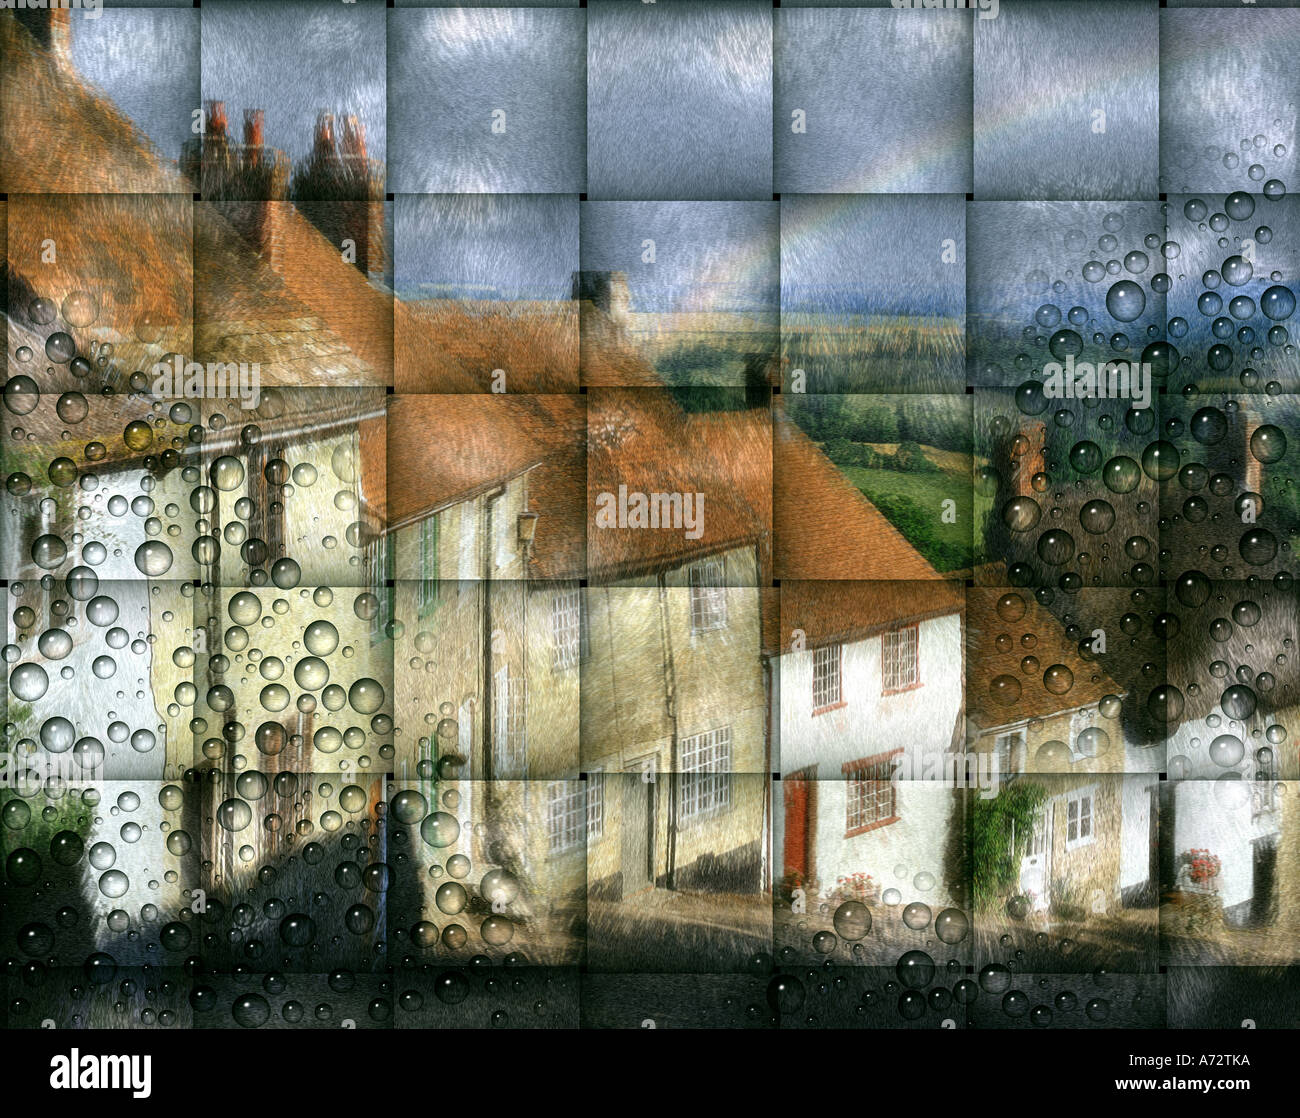 GB - DORSET:  Gold Hill at Shaftesbury (Digital Art) Stock Photo